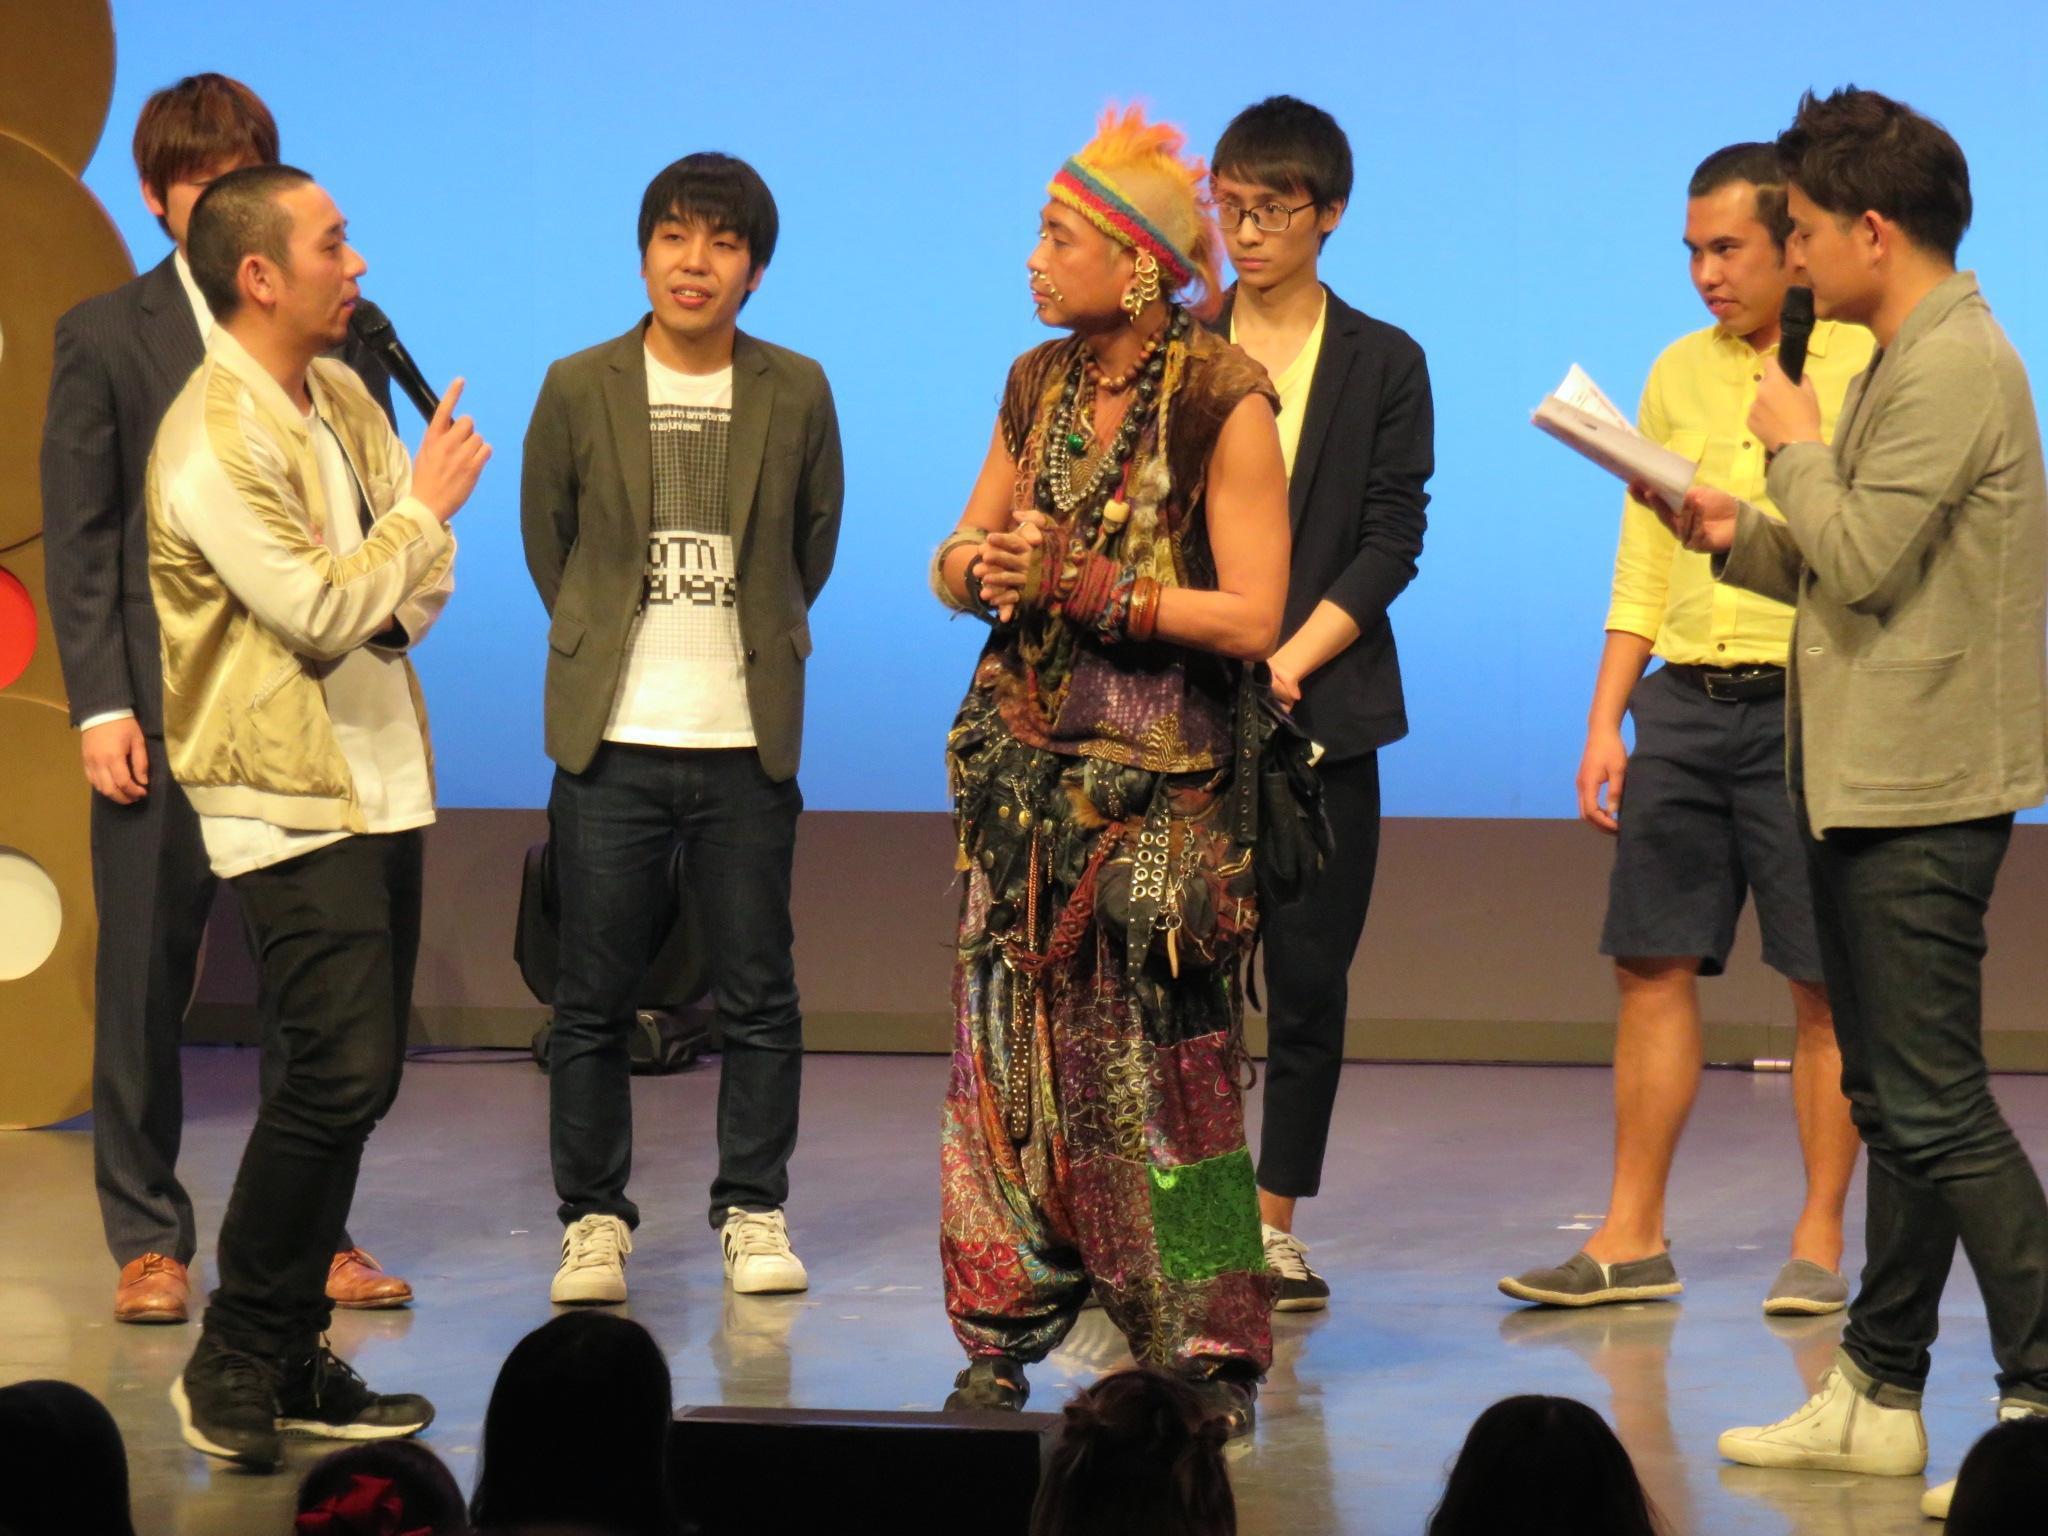 http://news.yoshimoto.co.jp/20170318121931-44f0ac8863354d2aa0a5f34c4fd2491ddc8fa85c.jpg